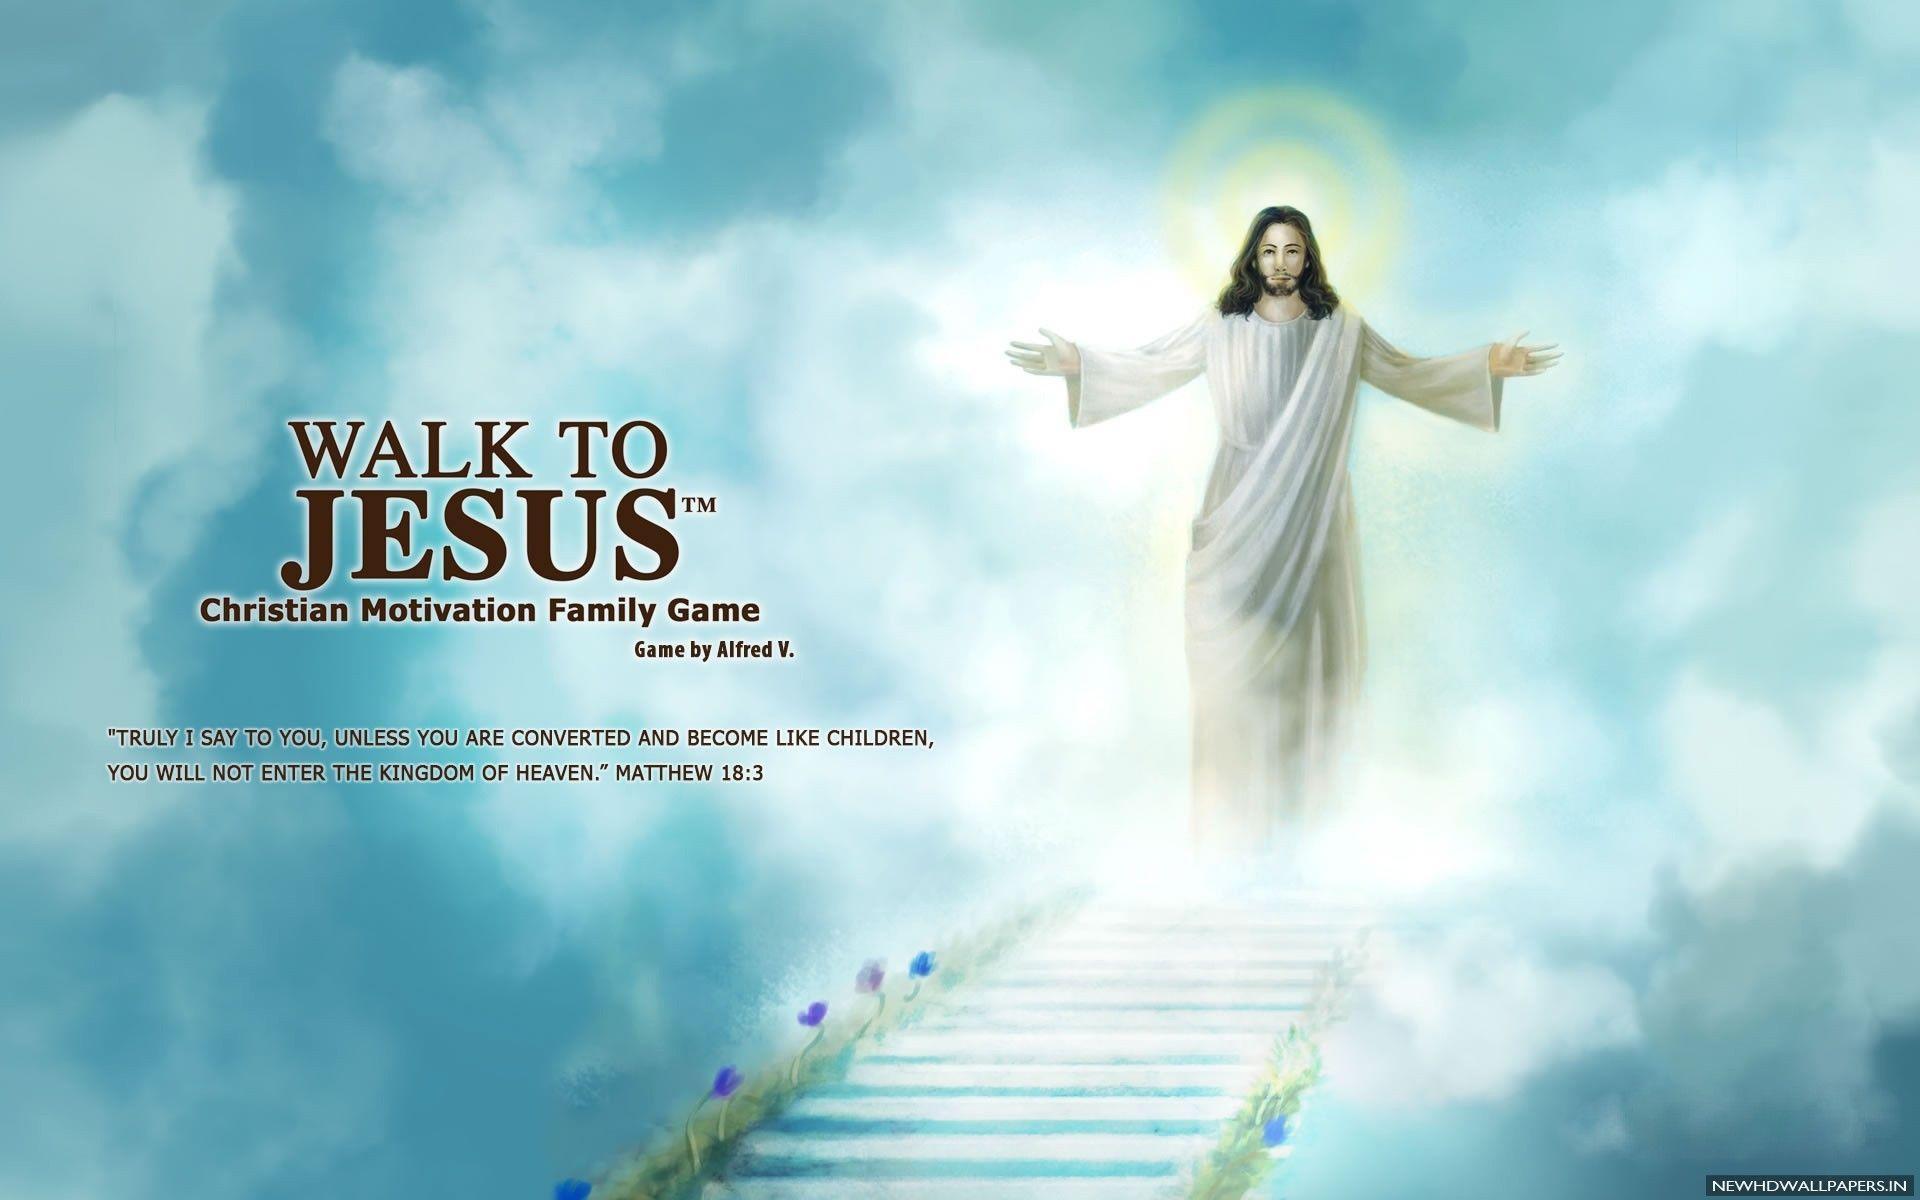 Jesus hd wallpapers wallpaper cave - Jesus hd 1080p ...